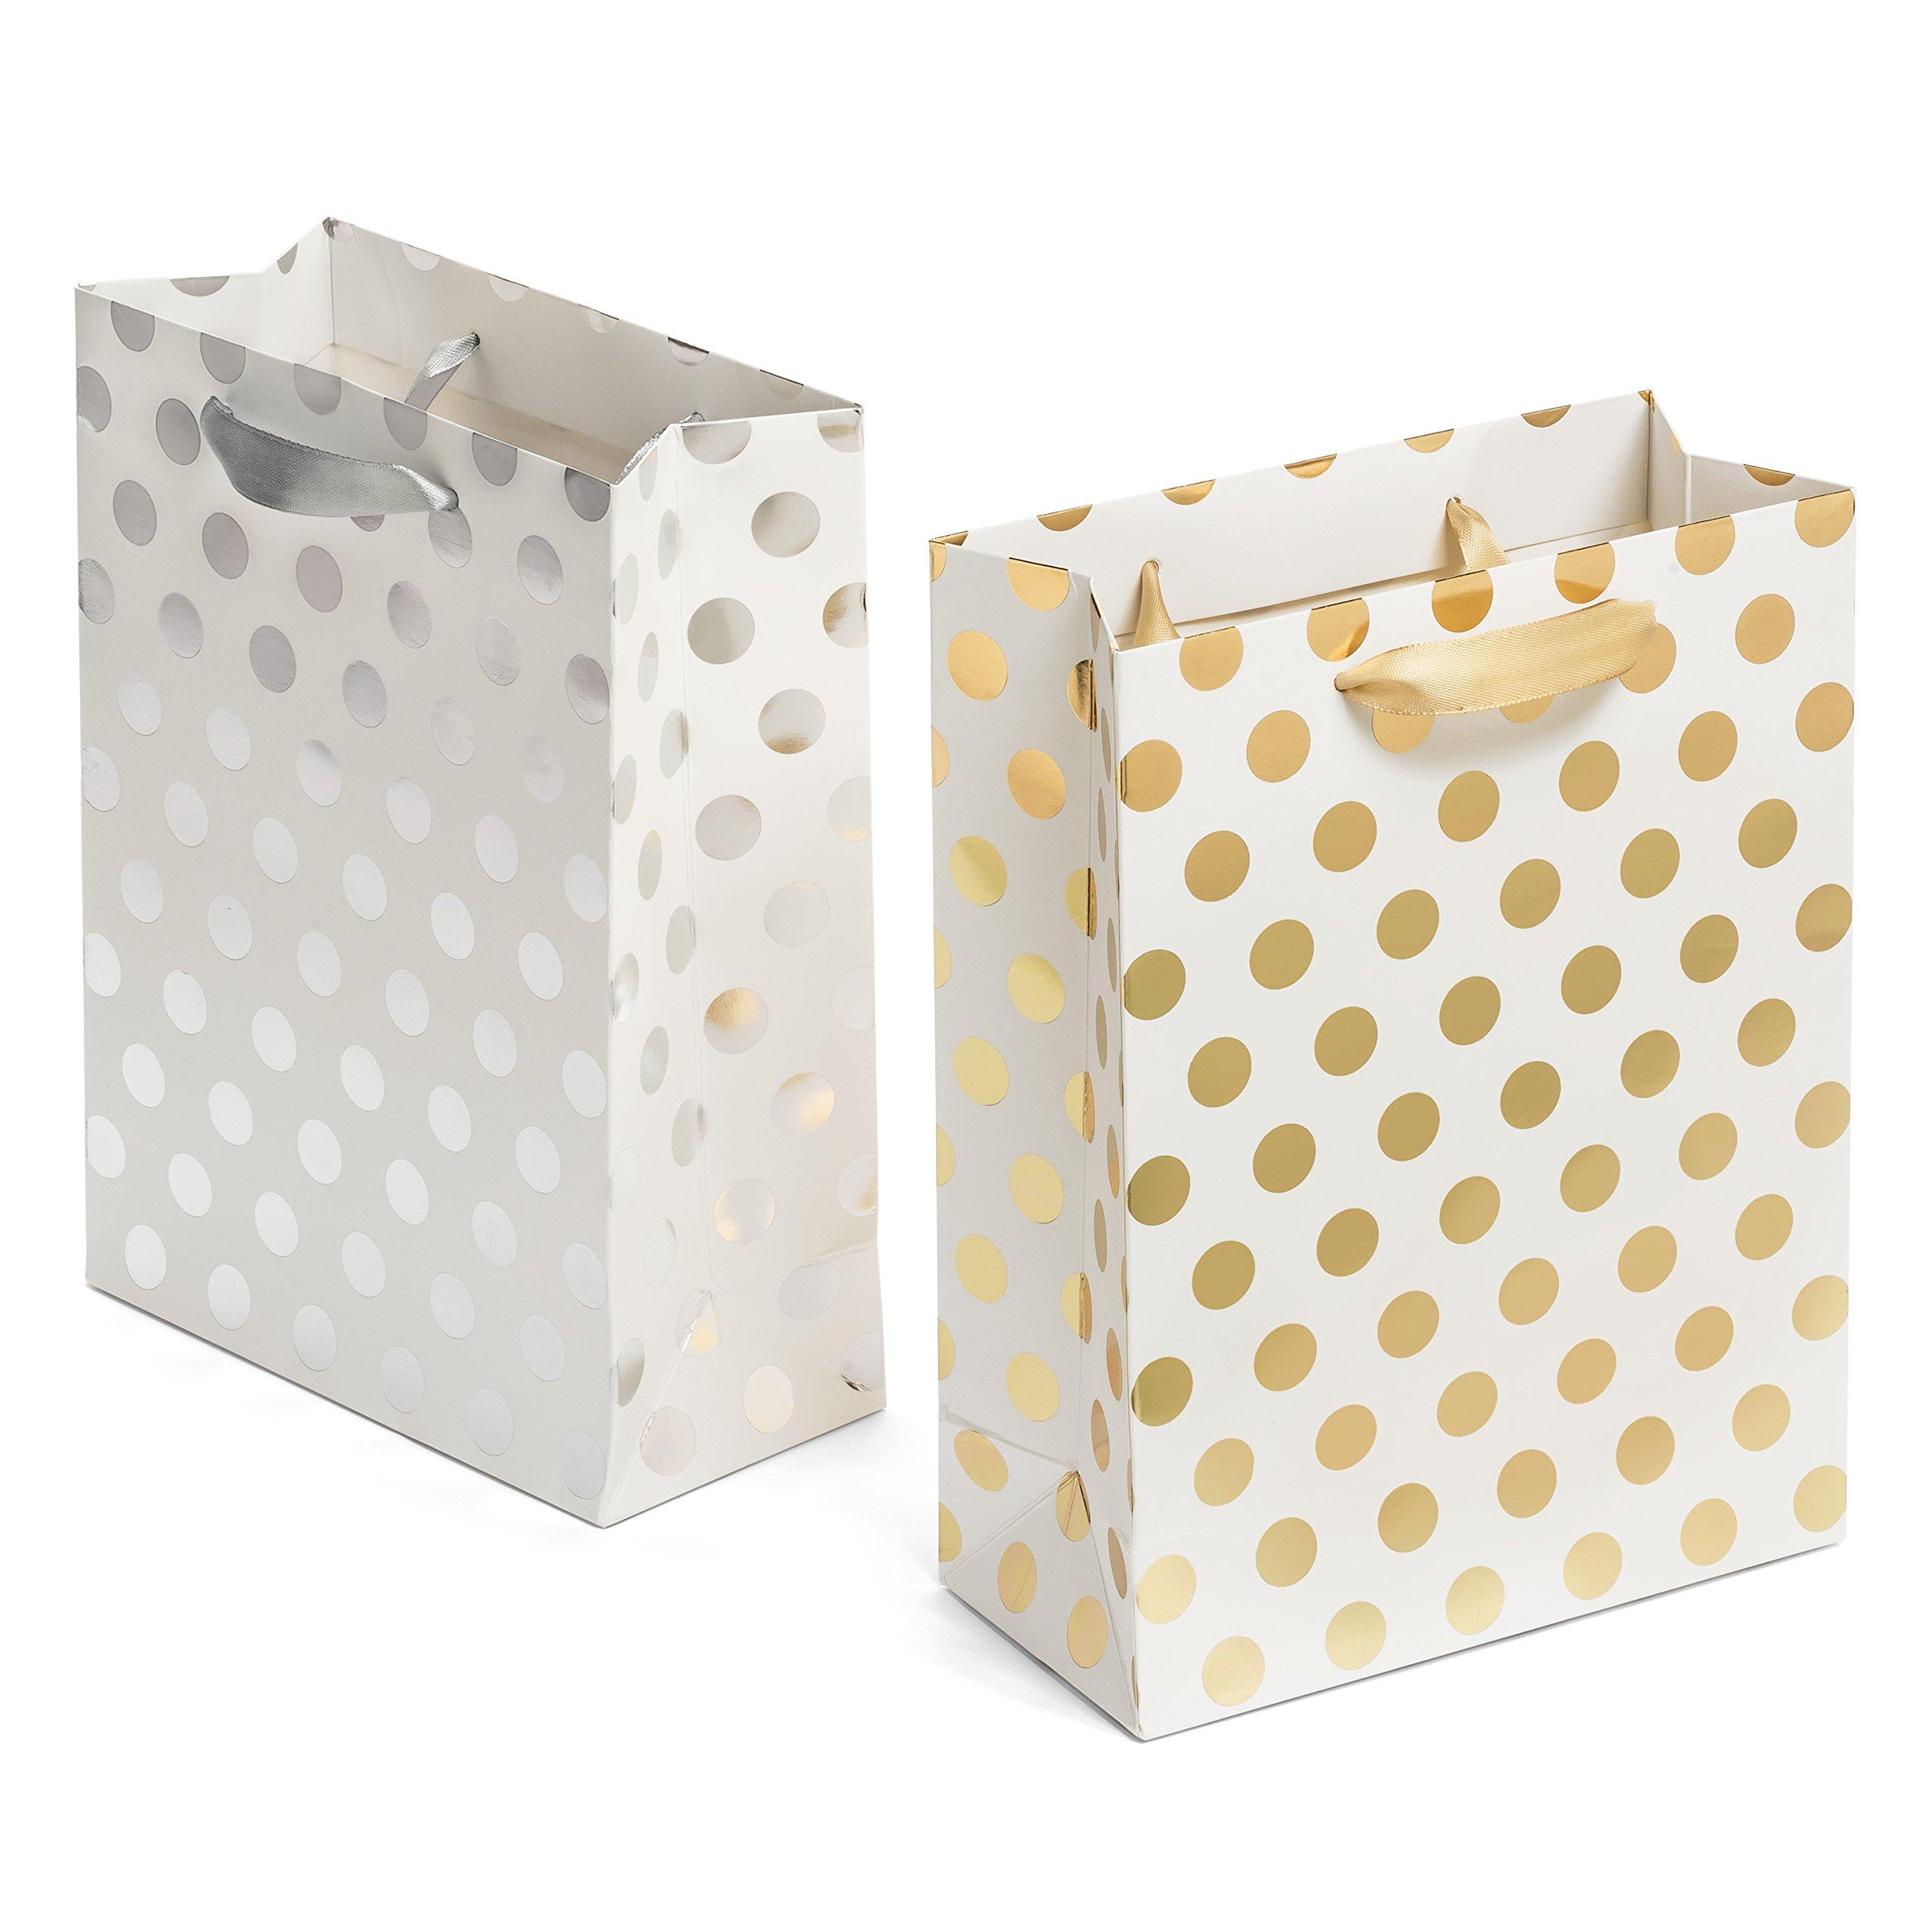 Amazon.com: 1 Dozen - Paper Small Silver Polka Dot Gift Bags: Health ...